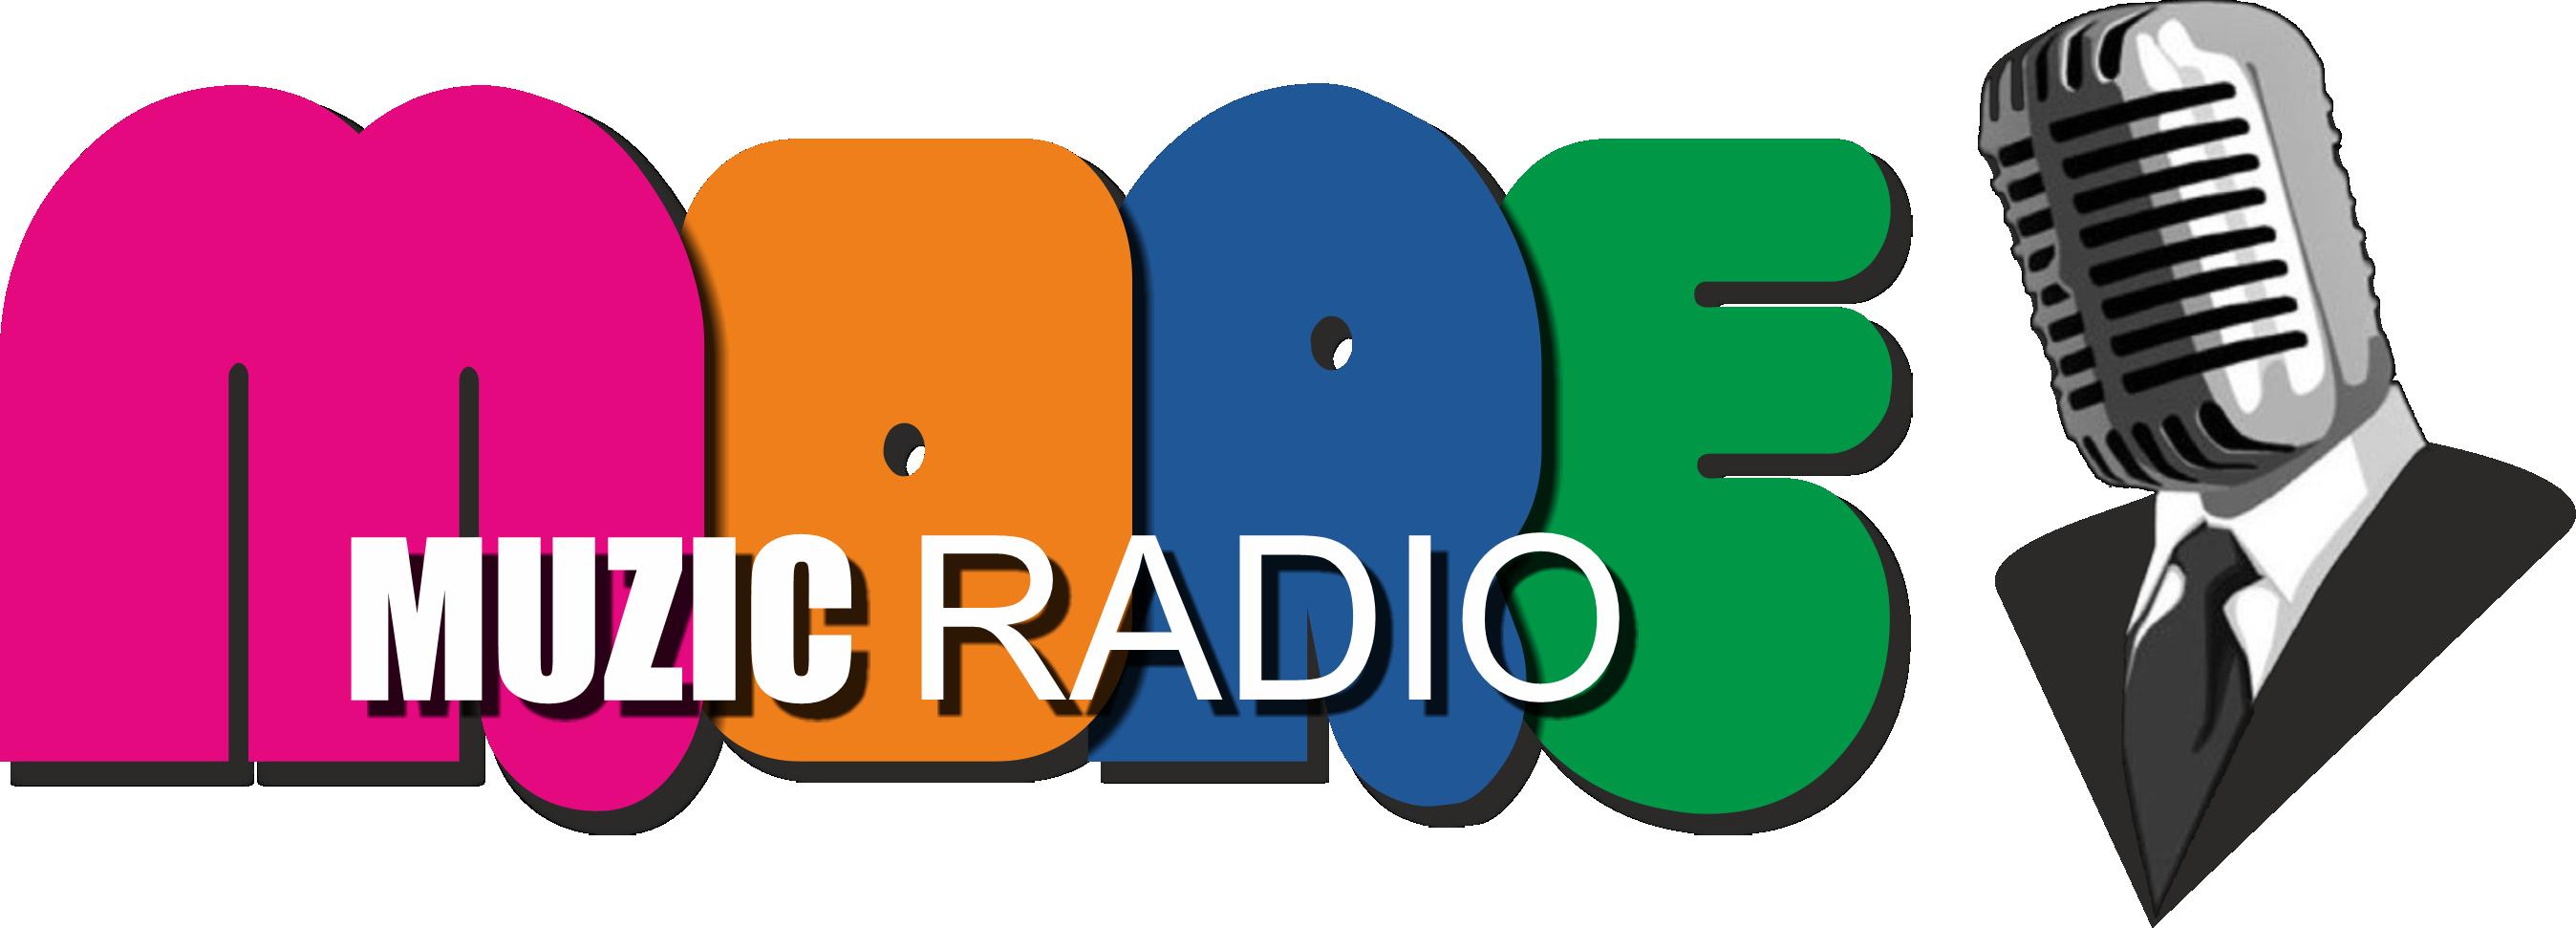 More Muzic Radio